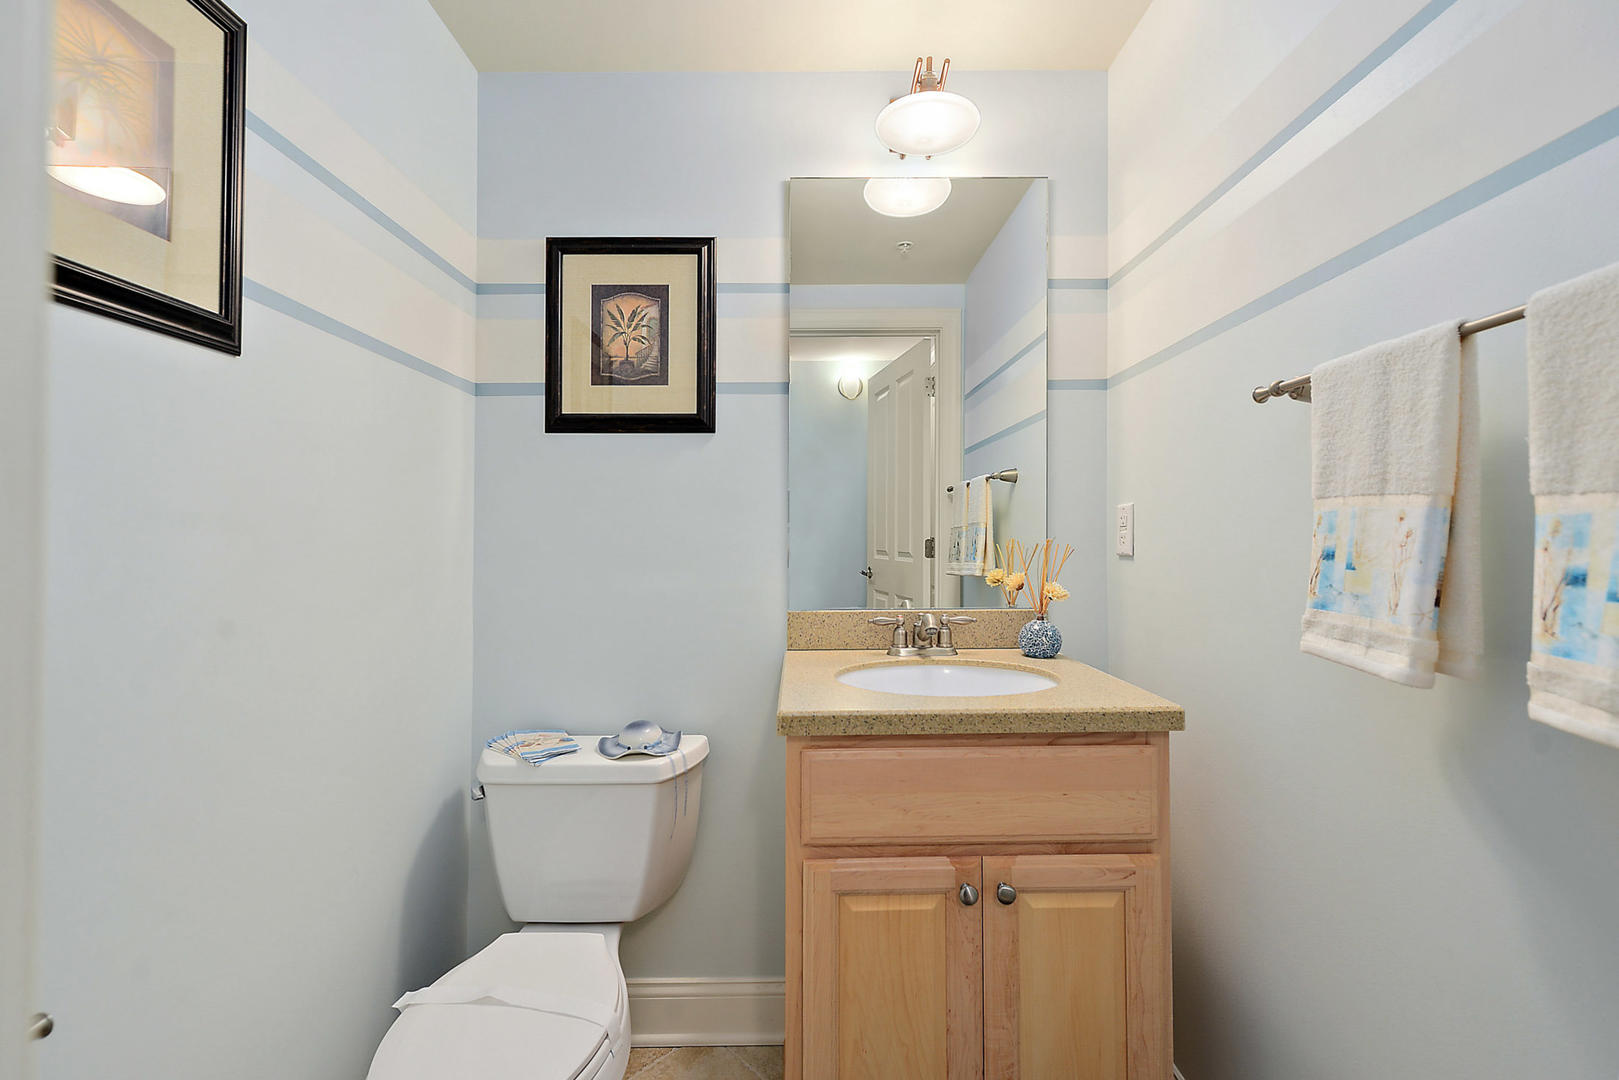 Rivendell 710 - Powder Room